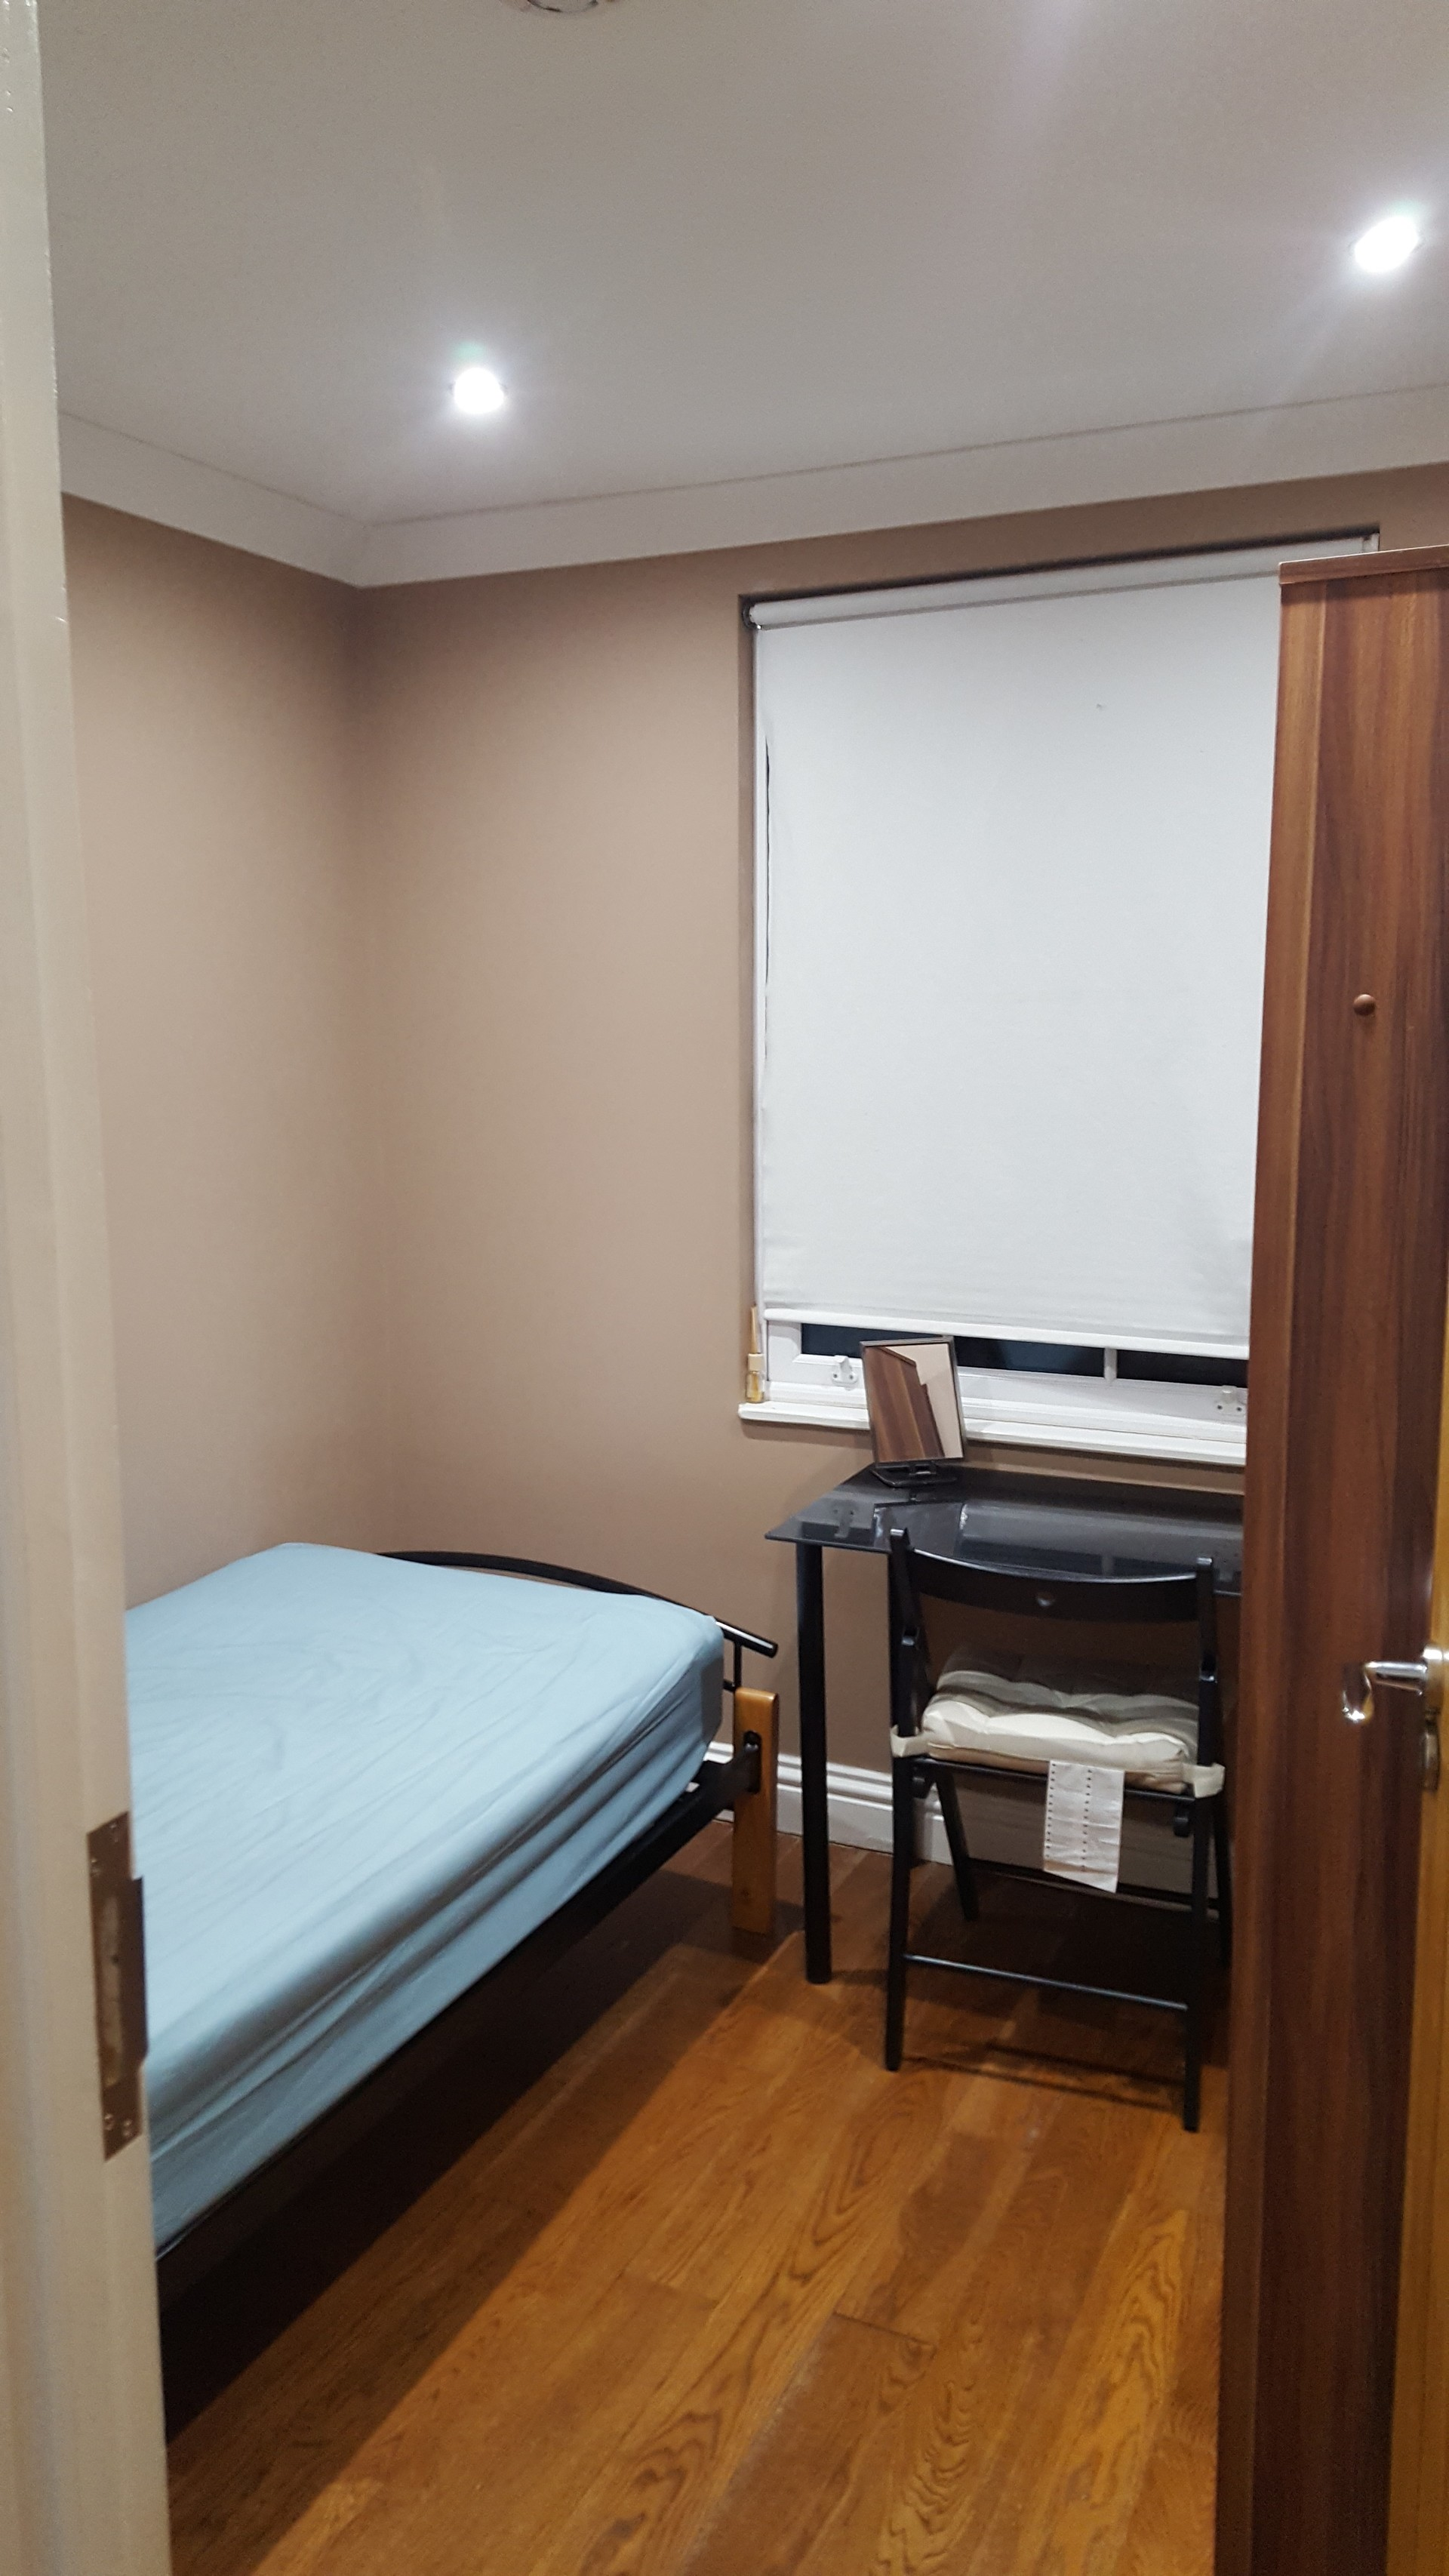 single-double-room-female-house-5fddd33a